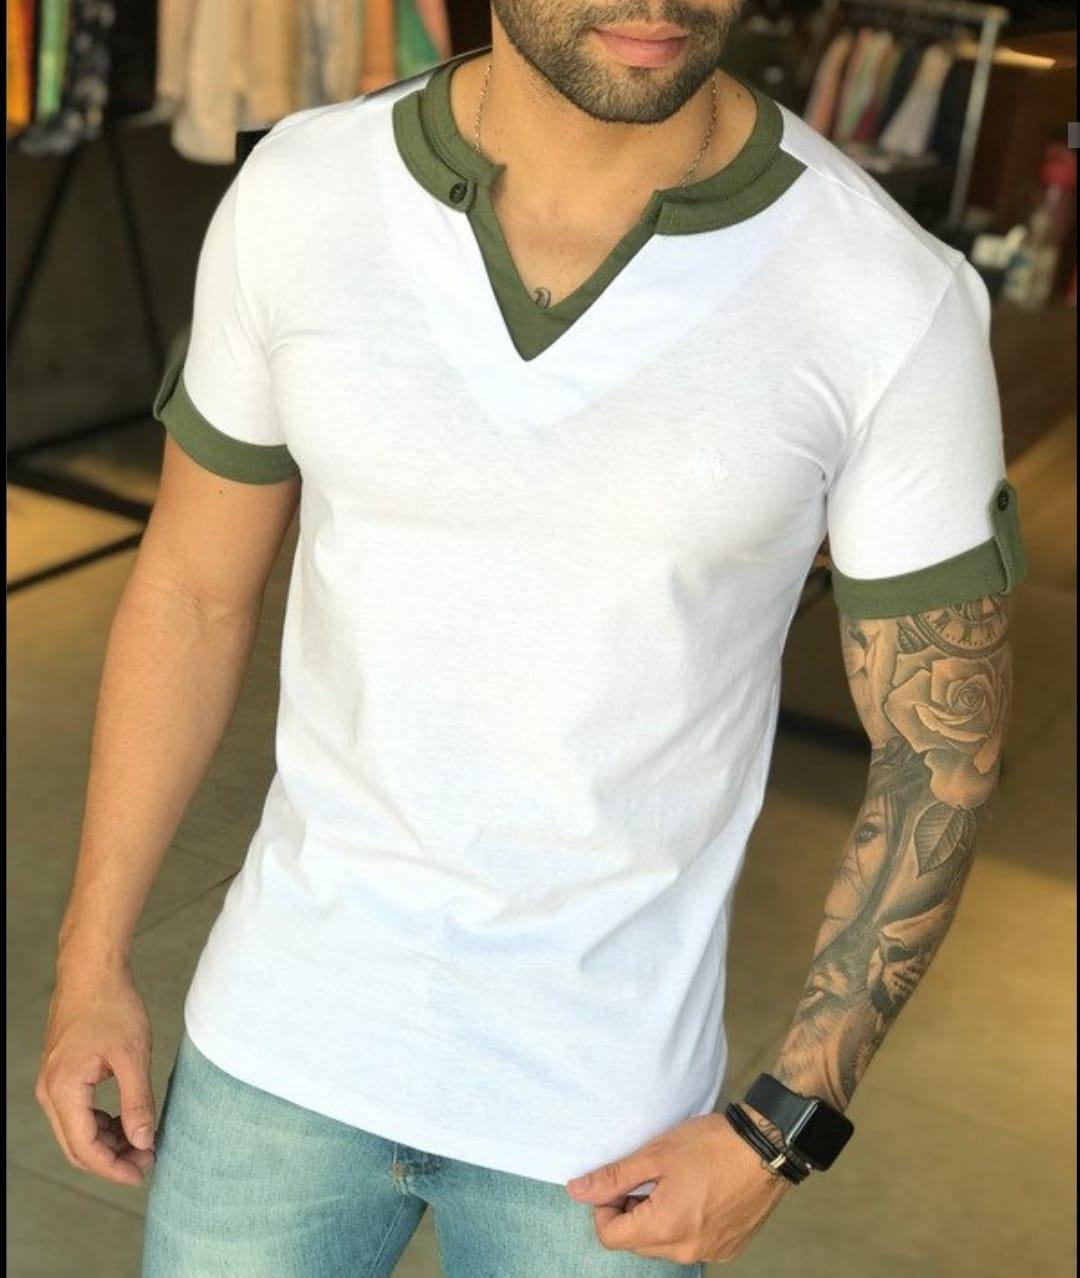 Camiseta M Artt Branca Detalhes Verde Gola V  - Harpia Moda - Moda Masculina & Acessórios